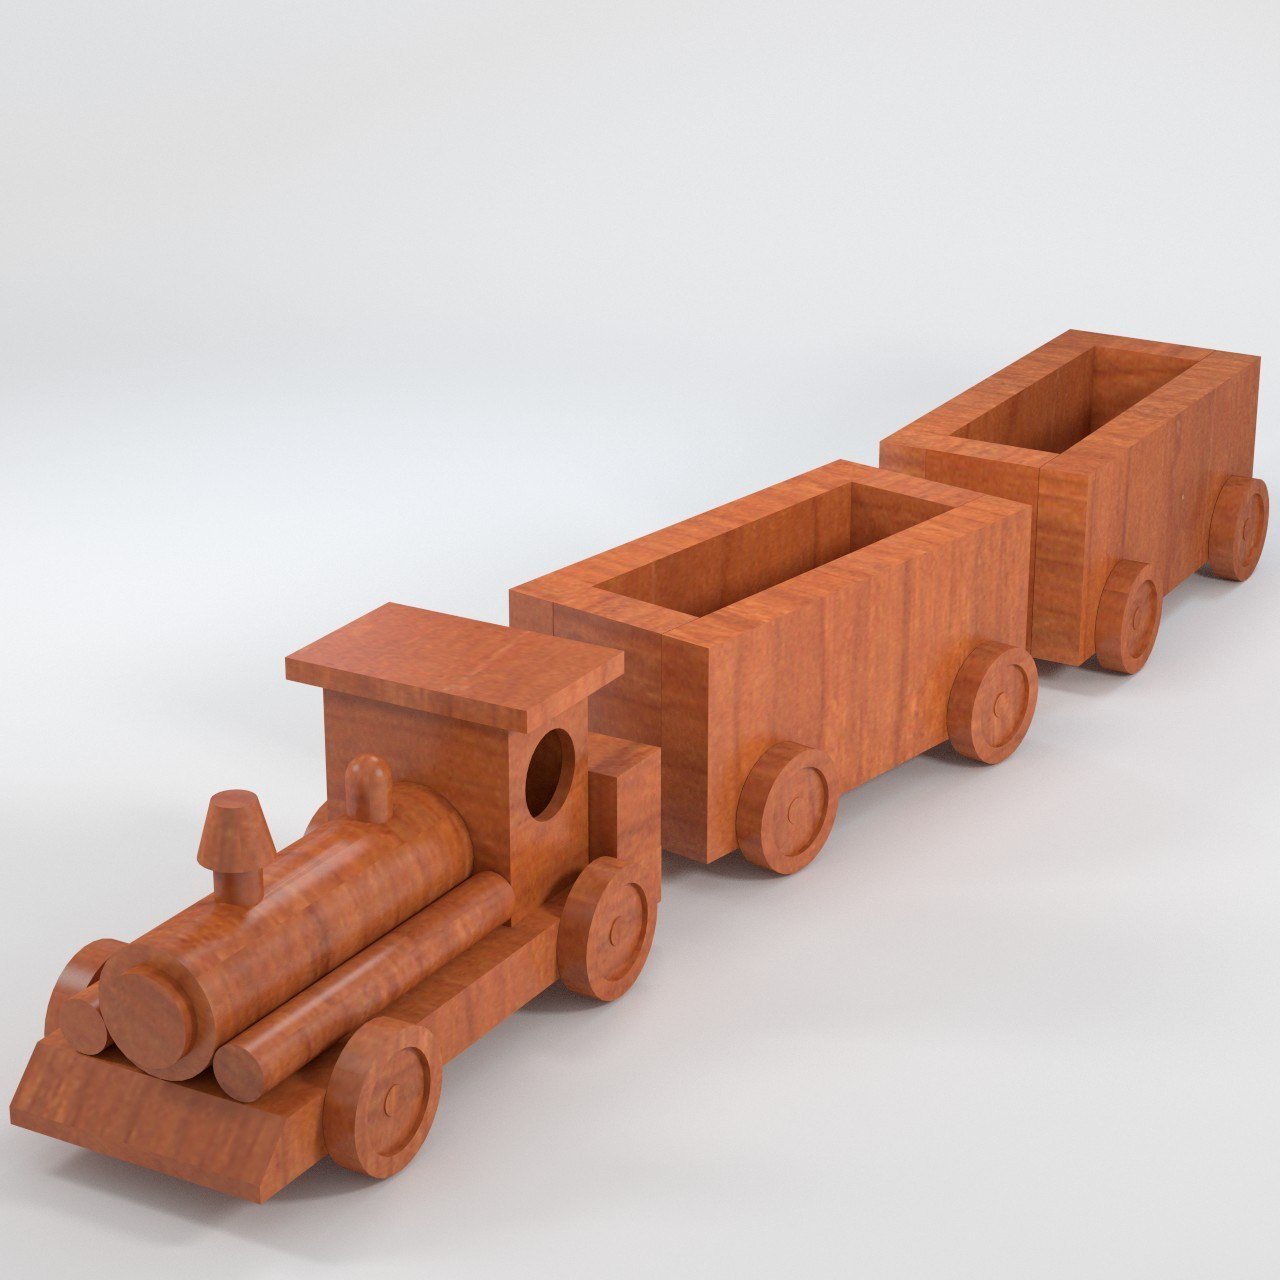 Wooden-Train-Toy---Screen-00.jpg